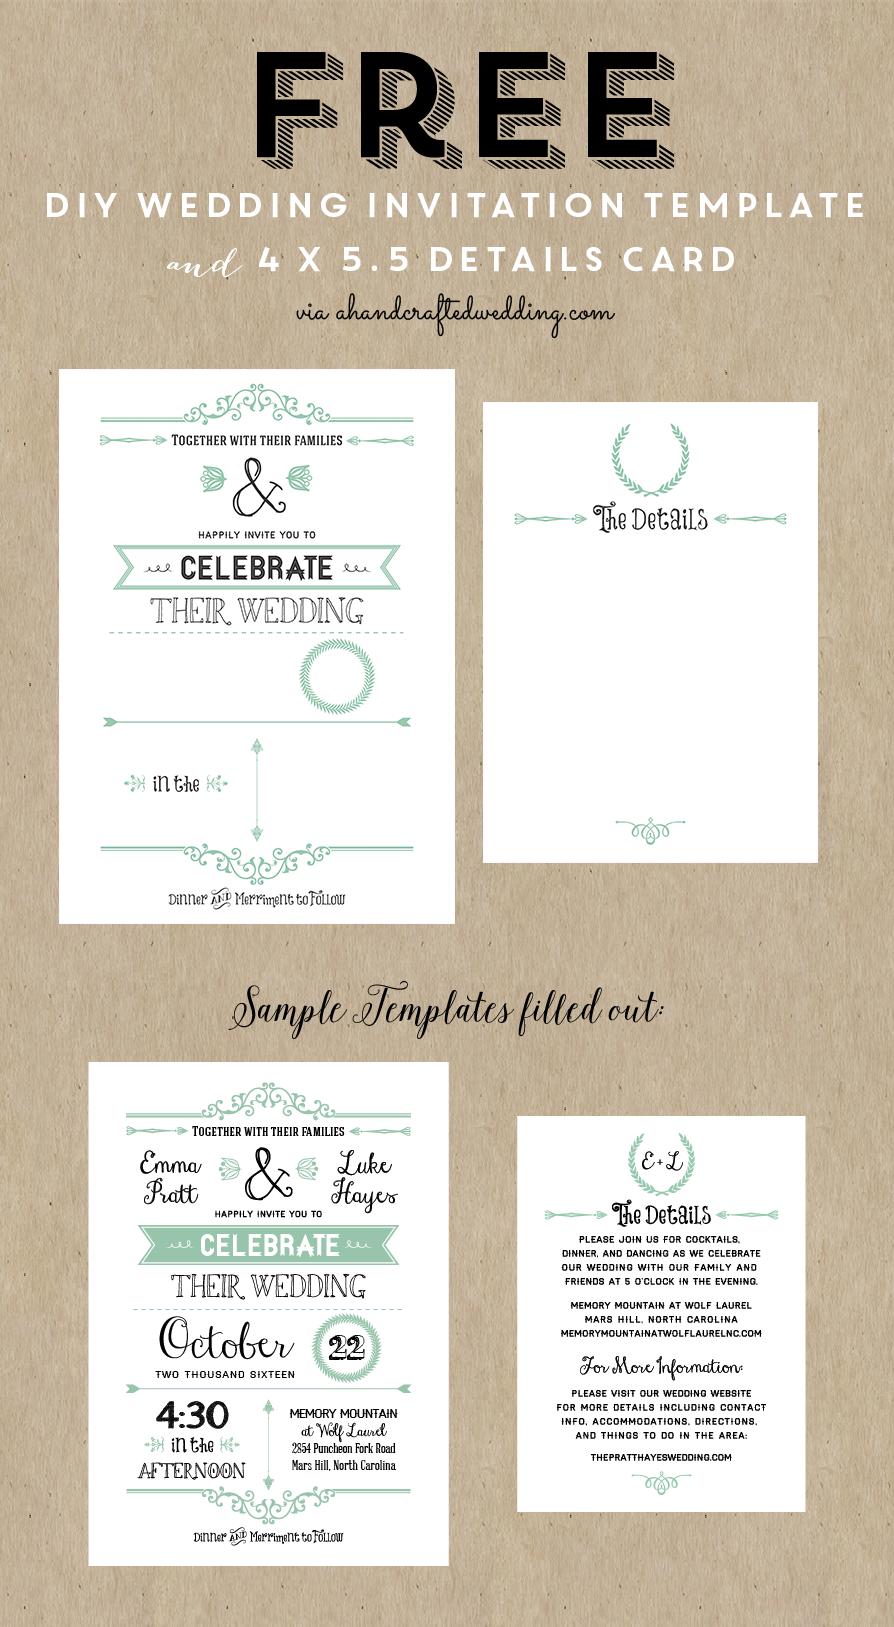 Free Wedding Invitation Template Via Ahandcraftedwedding Free Printable Wedding Invitations Diy Wedding Invitations Templates Free Wedding Invitation Templates